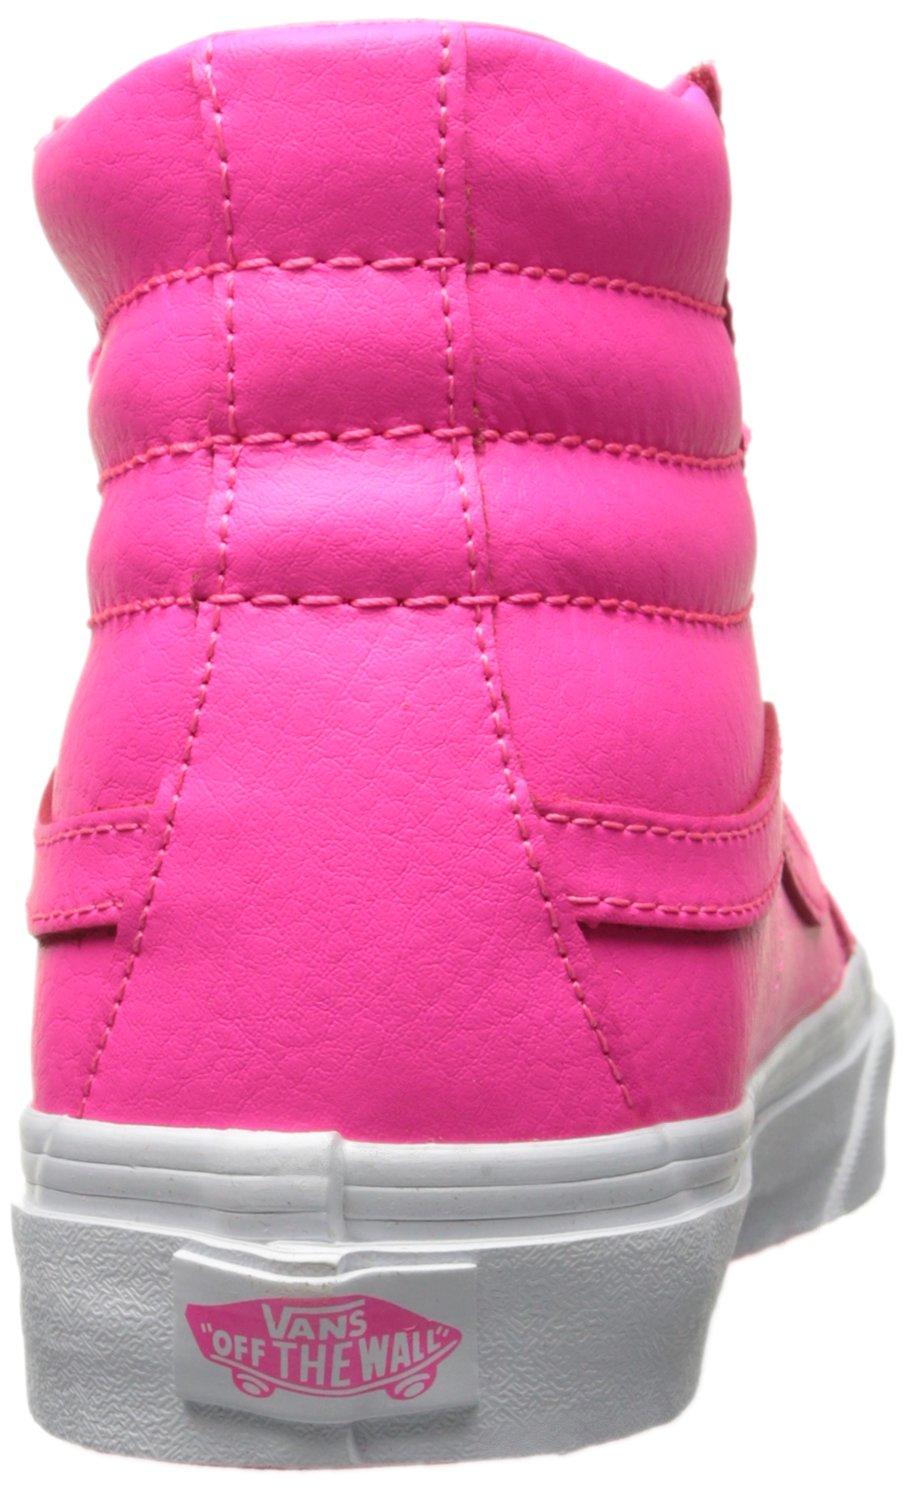 Vans Unisex Perf Leather Sk8-Hi Slim Zip True White Sneaker - 7.5 B01I2CL2ZO 8.5 M US Women / 7 M US Men|Neon Pink/True White